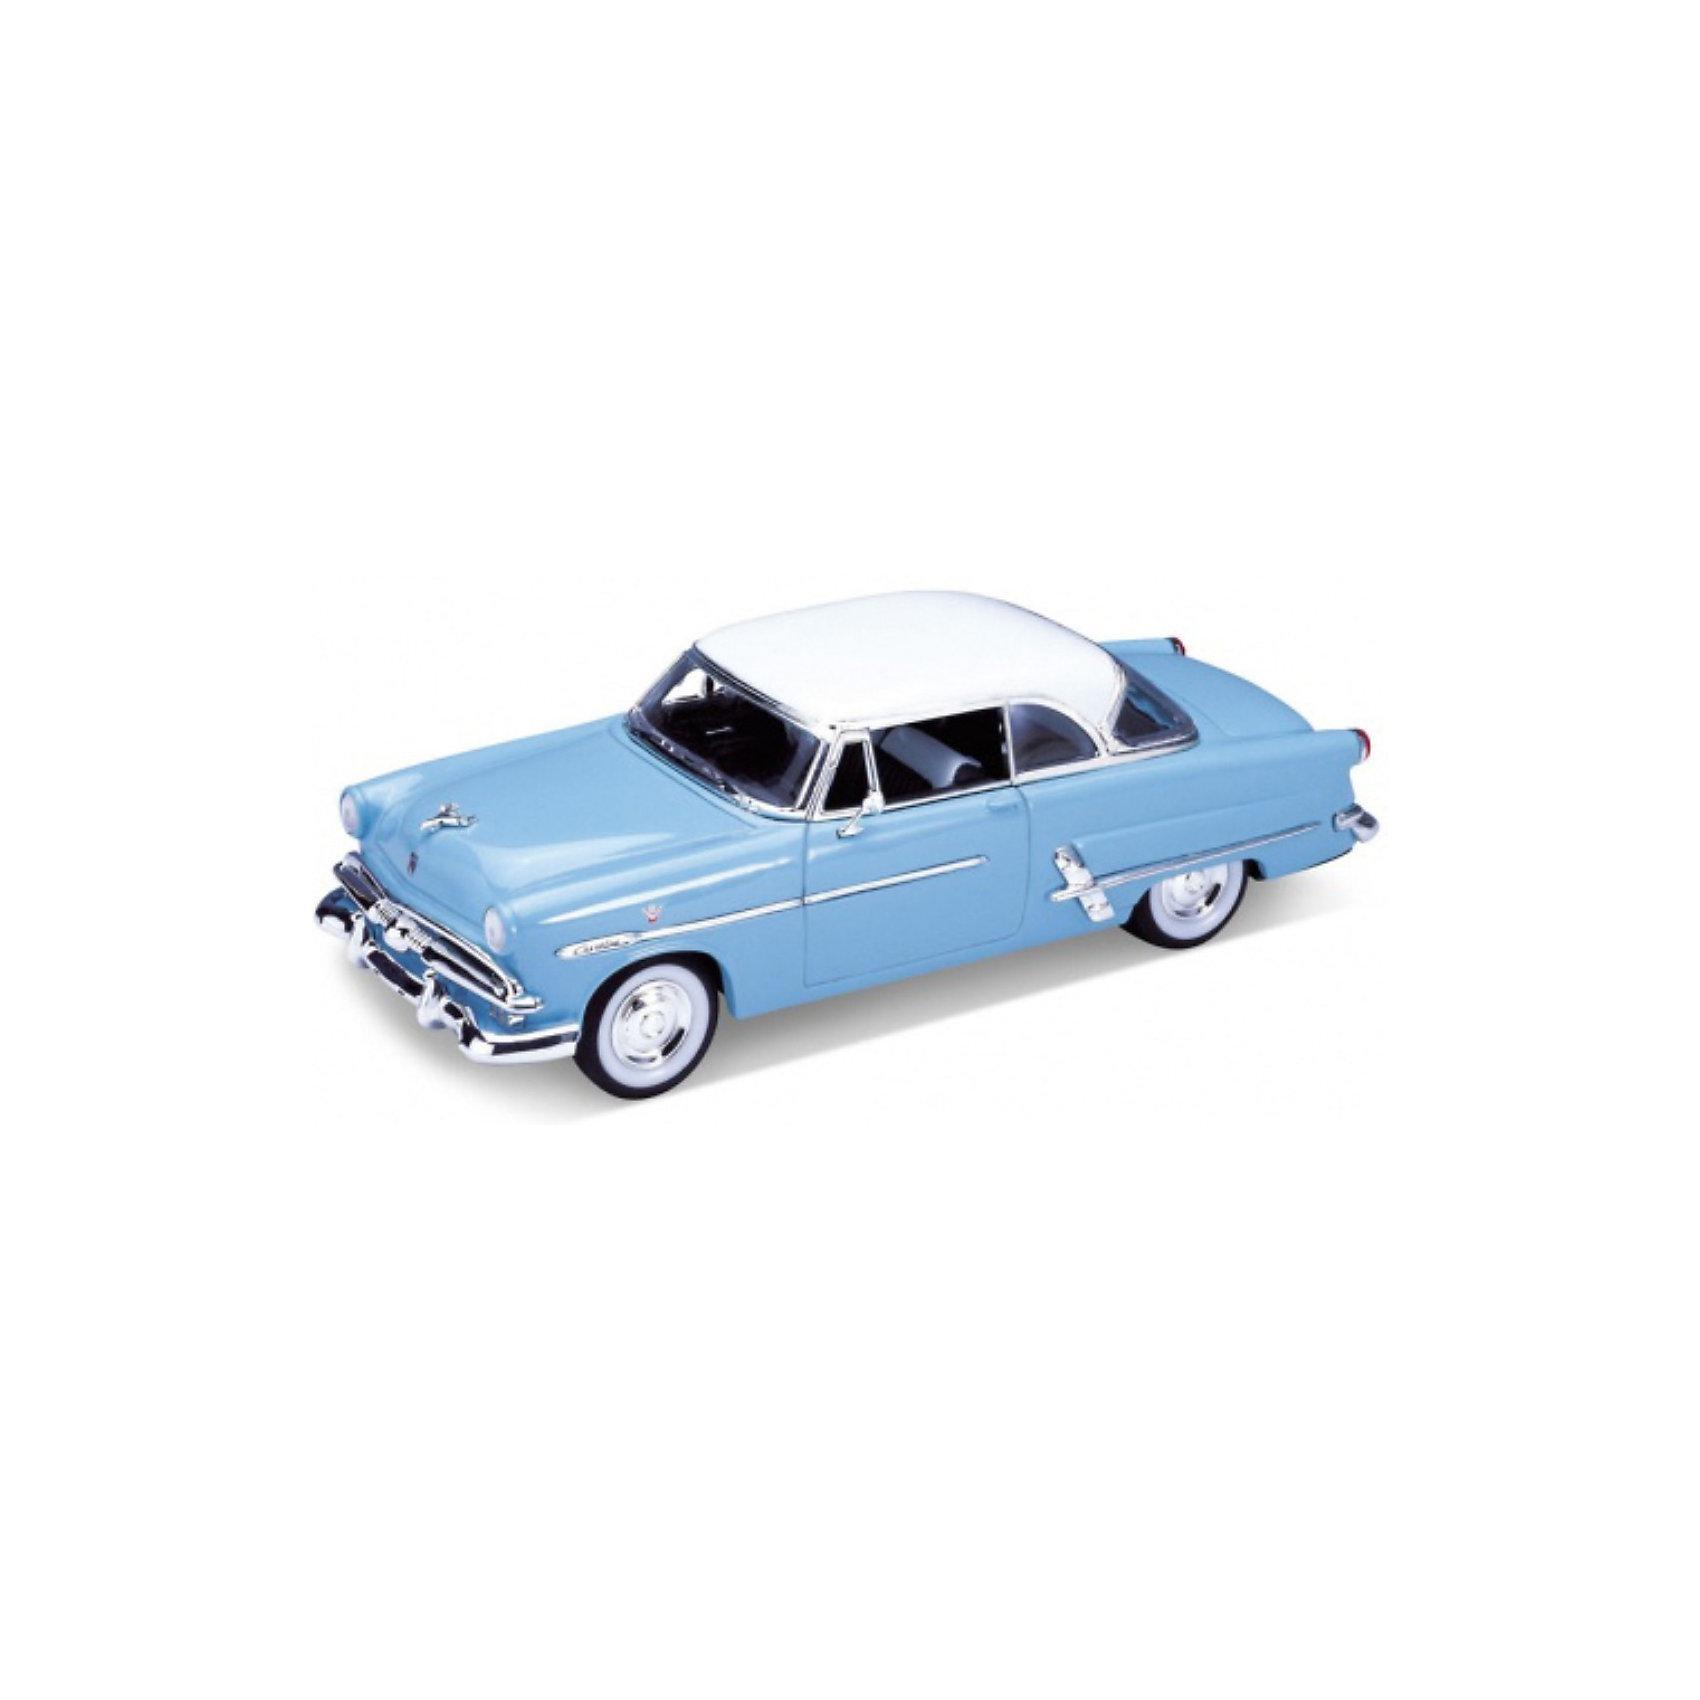 Welly Модель винтажной машины 1:24 Ford Victoria 1953, Welly welly модель машины 1 24 aston martin v12 vantage welly